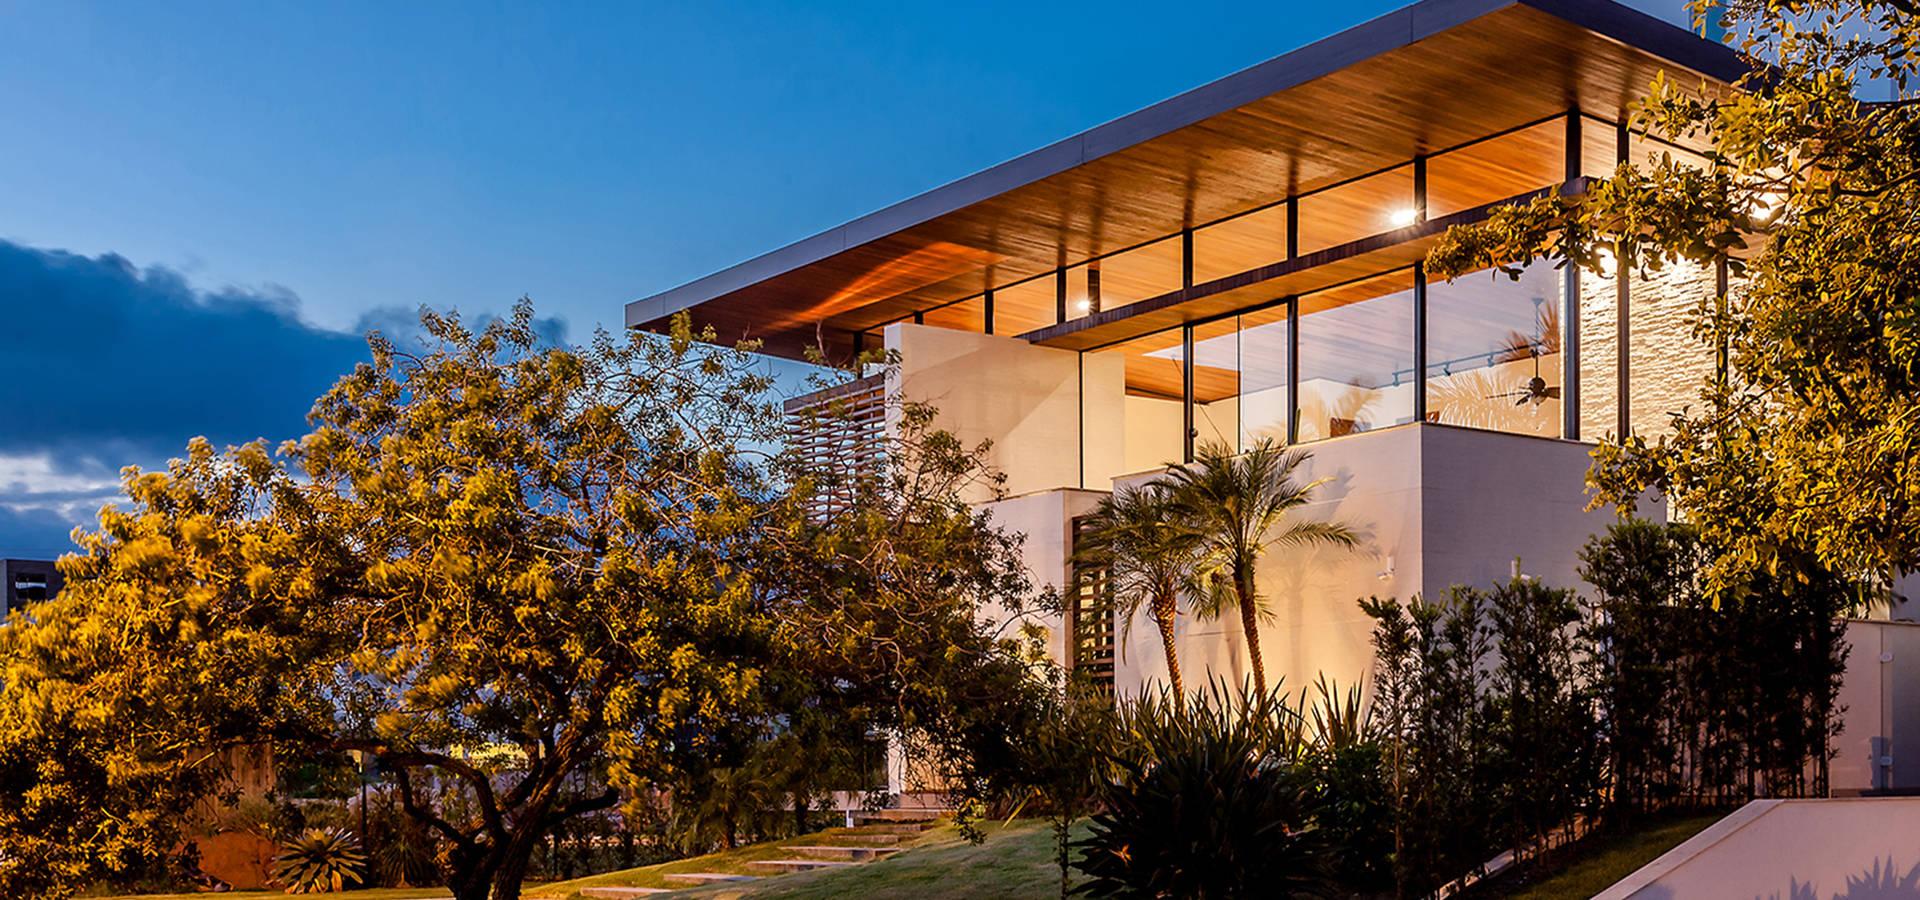 Ruschel Arquitetura e Urbanismo